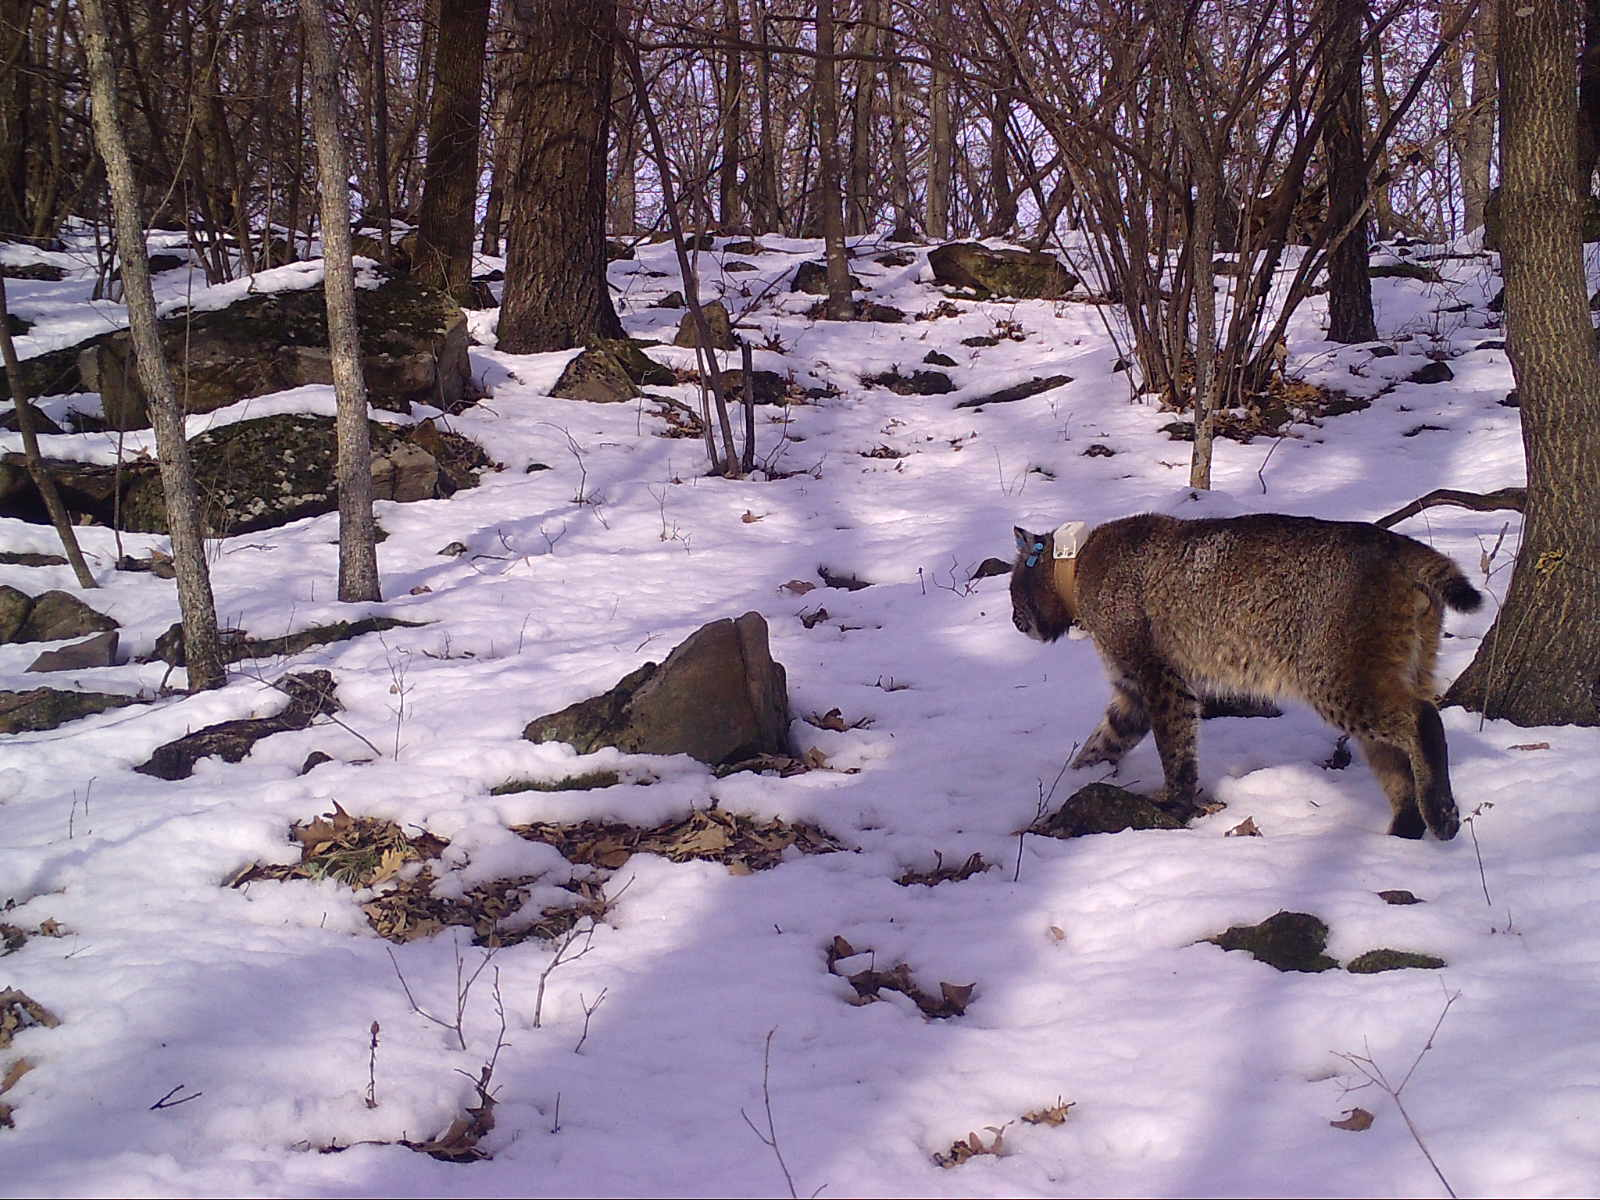 A bobcat with a radio collar around its neck.